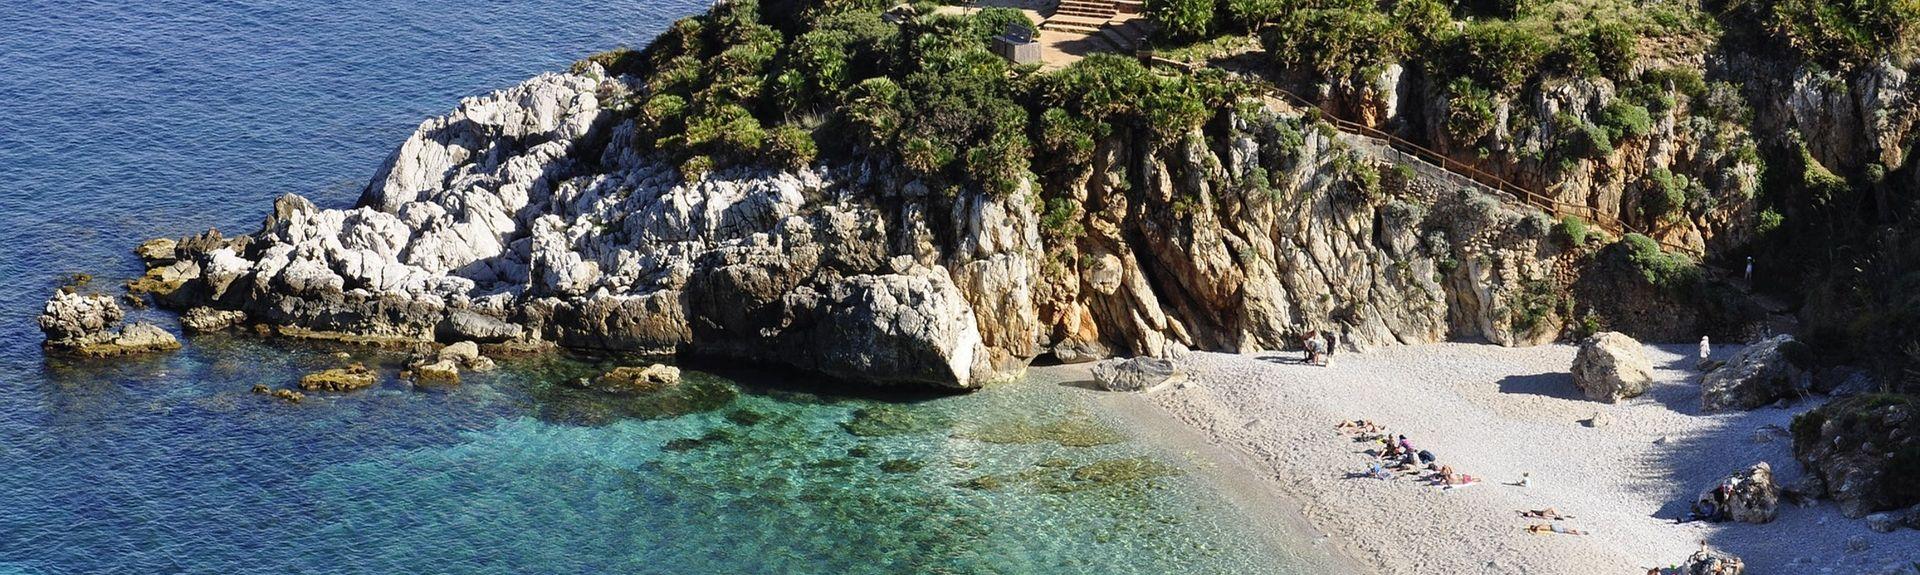 Capo Mongerbino, Aspra, Sicilia, Italia